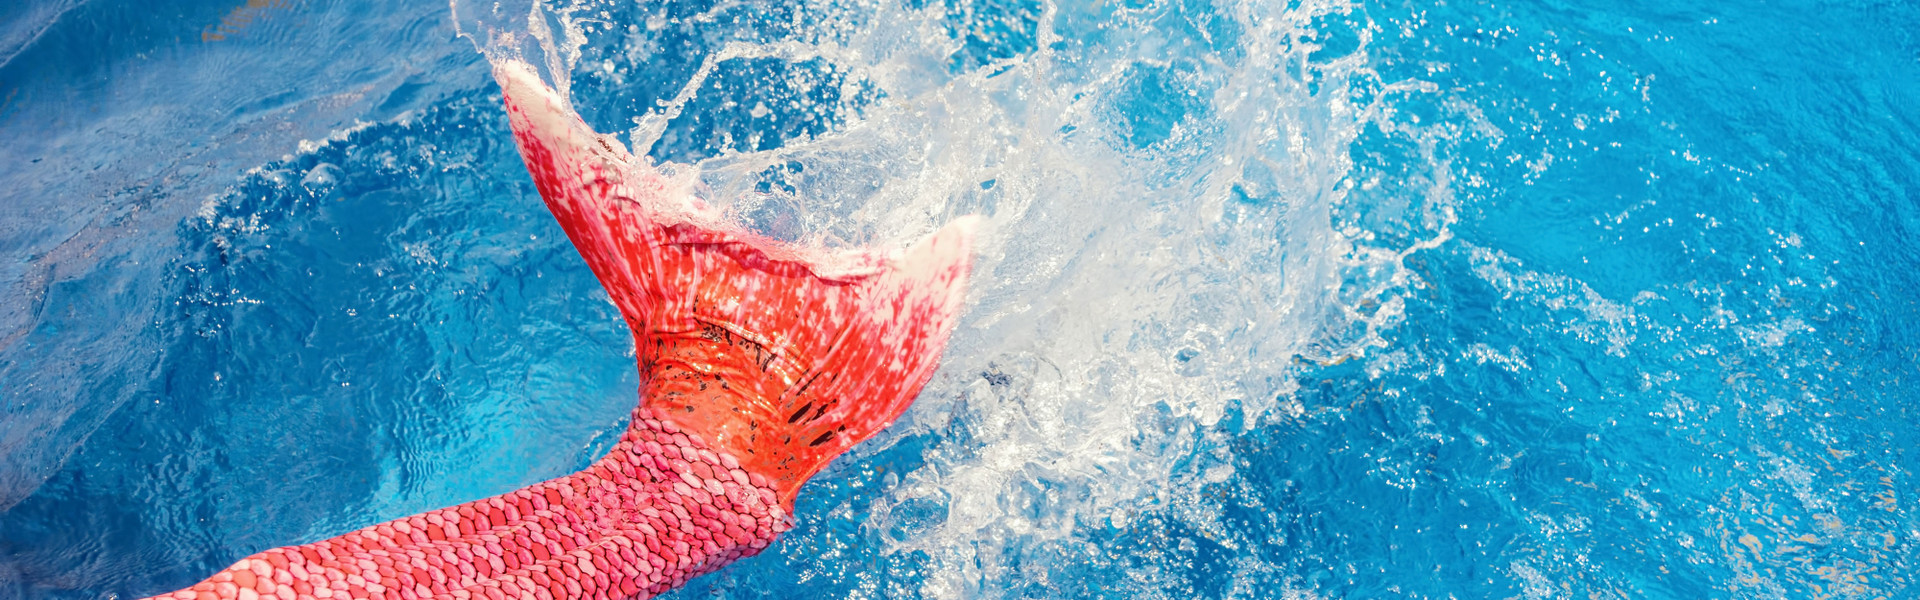 Access your Inner Mermaid or treat your Princess Ariel to Mermaid Swimming Classes at Westgate Las Vegas Resort & Casino